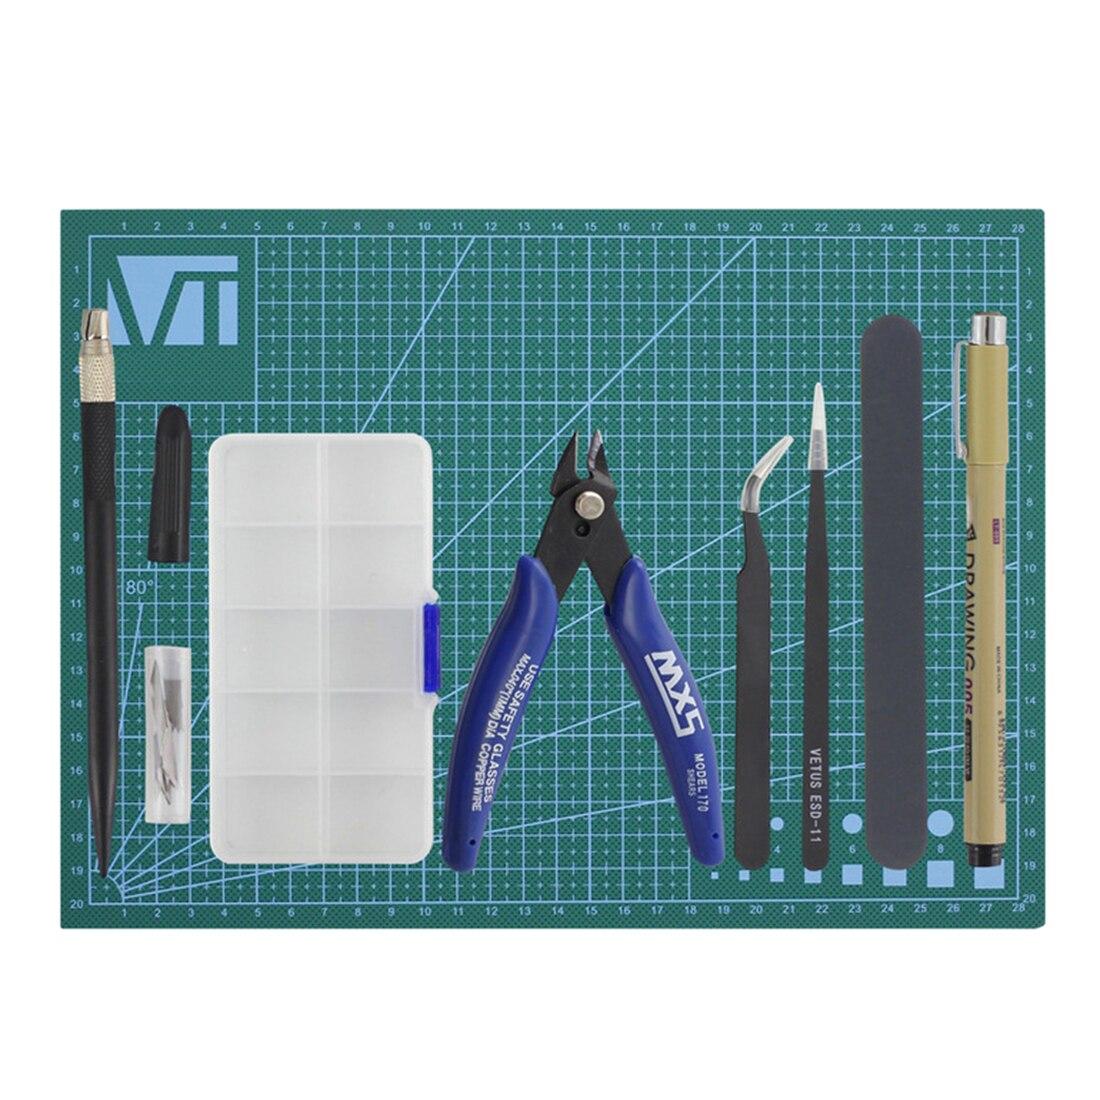 7Pcs for Gundam Model Tools Kit Modeler Basic Tools Craft Set Hobby Building Tools Kit